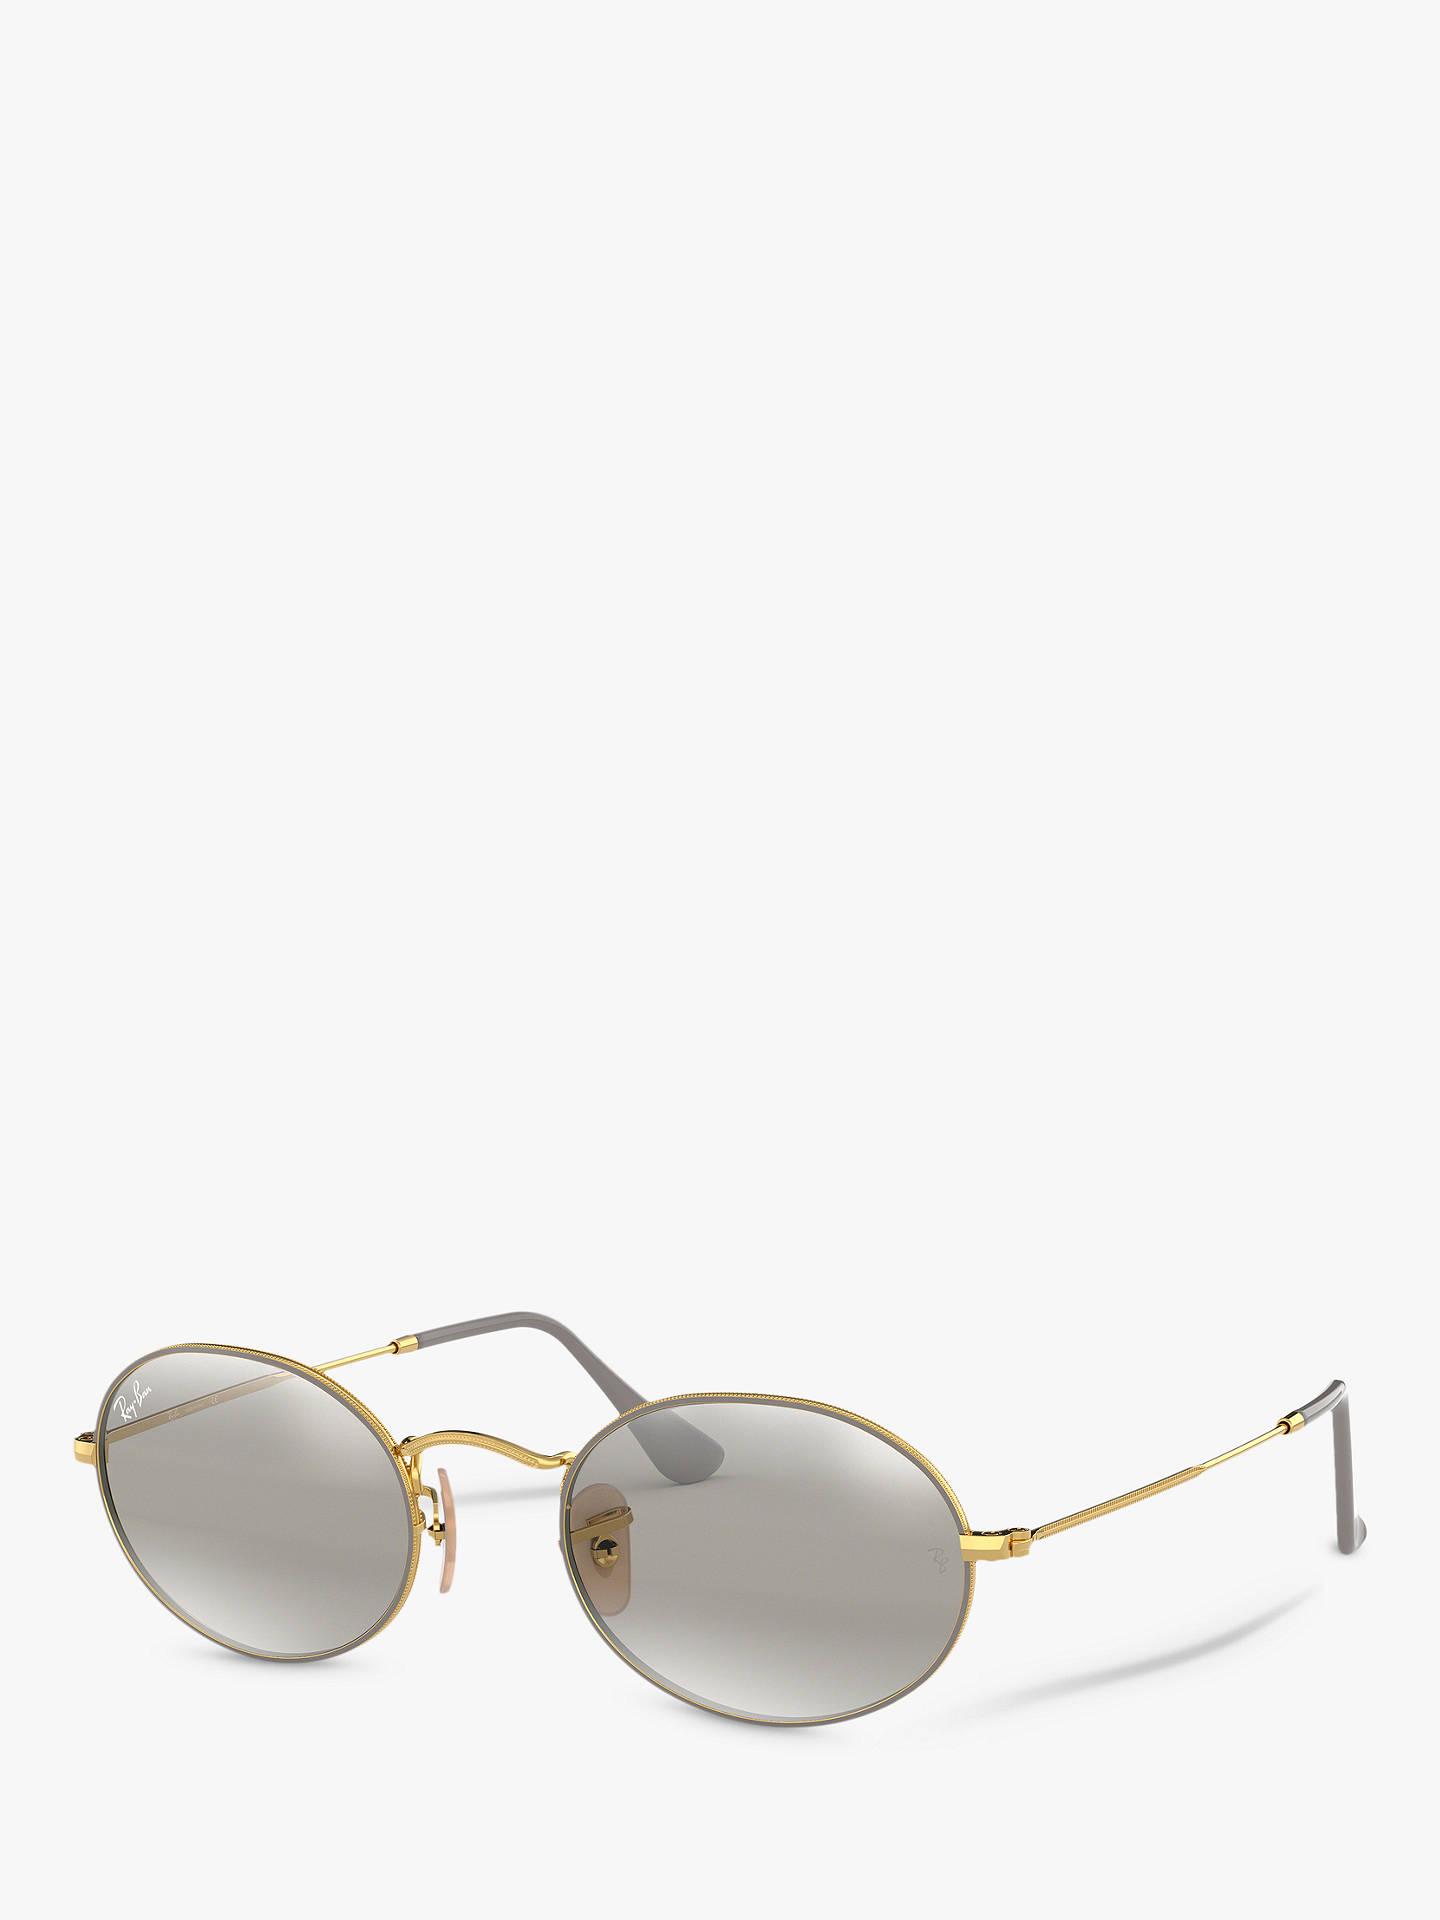 08b34f2272 BuyRay-Ban RB3547 Unisex Oval Flat Lens Sunglasses